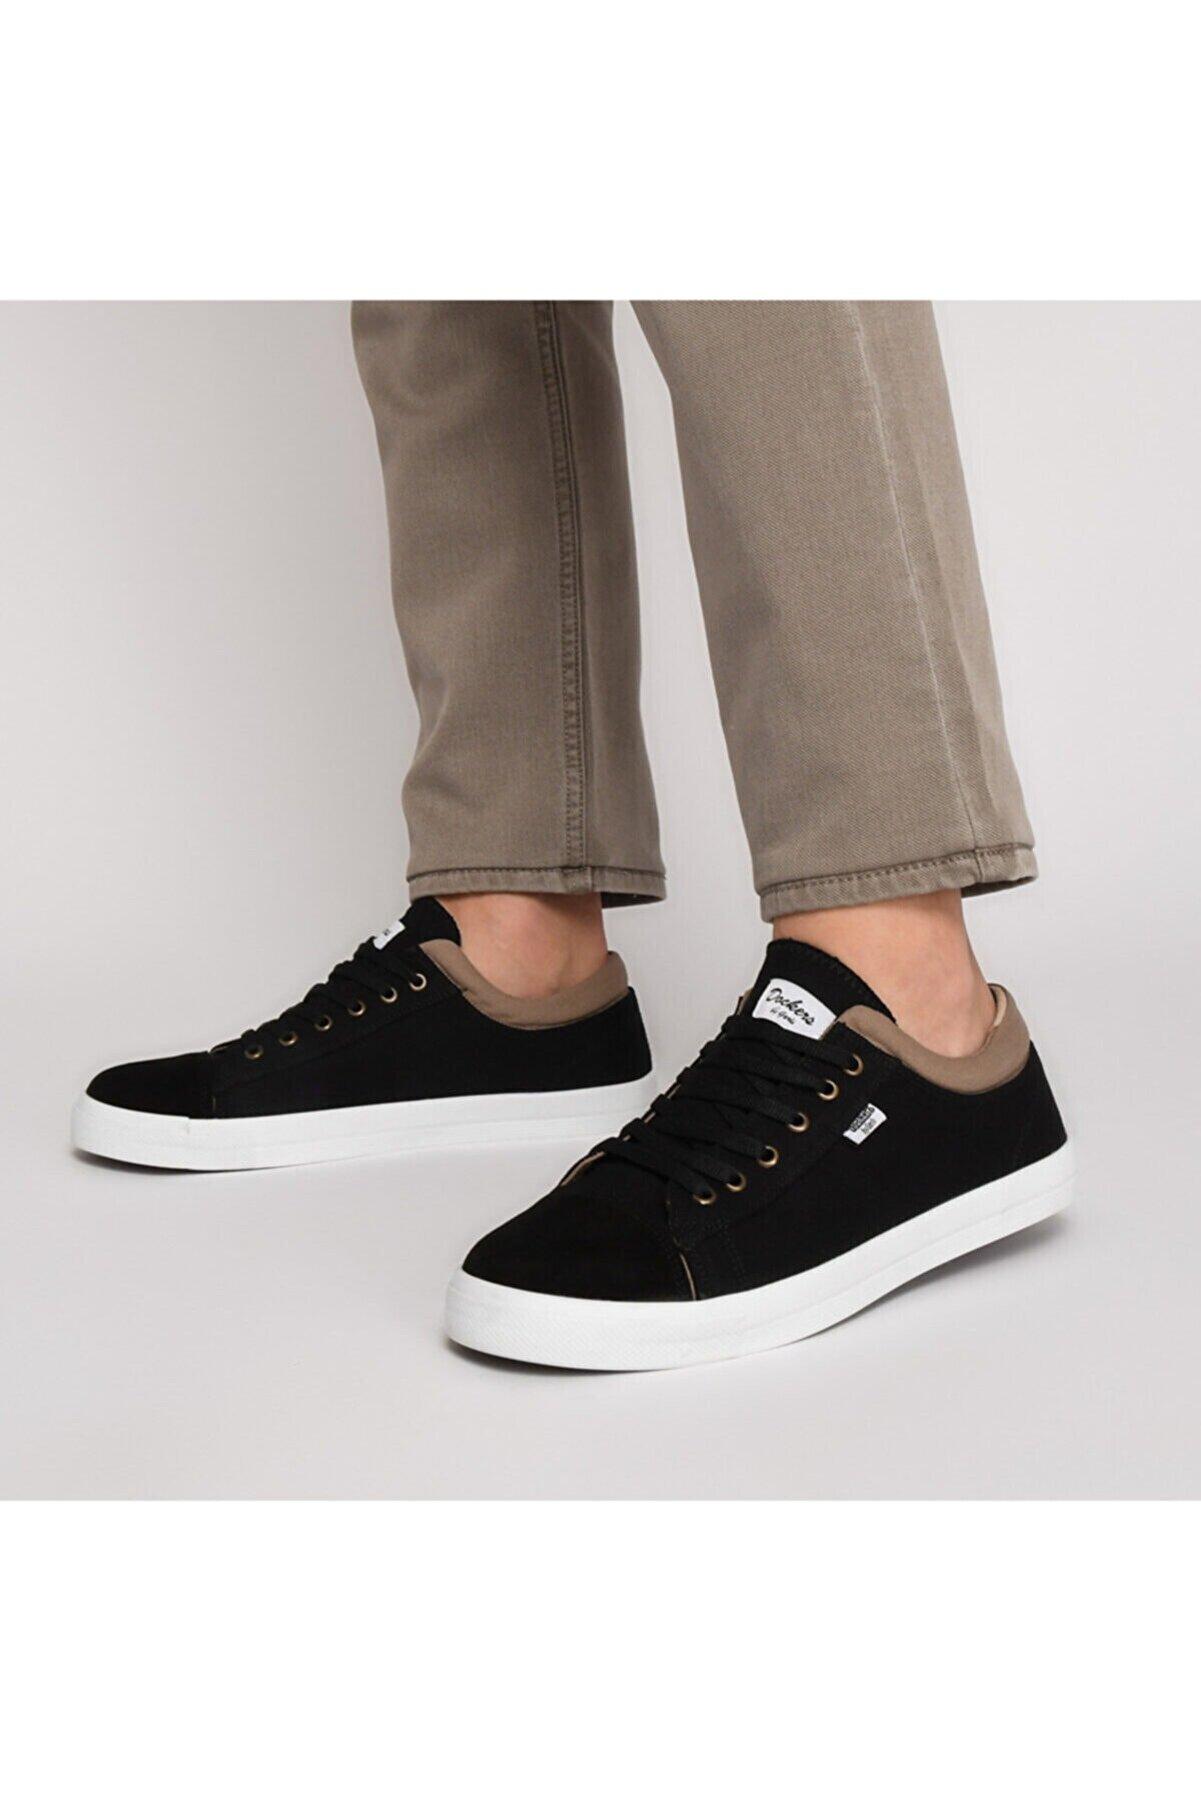 Dockers 228632 Siyah Erkek Sneaker 100495458